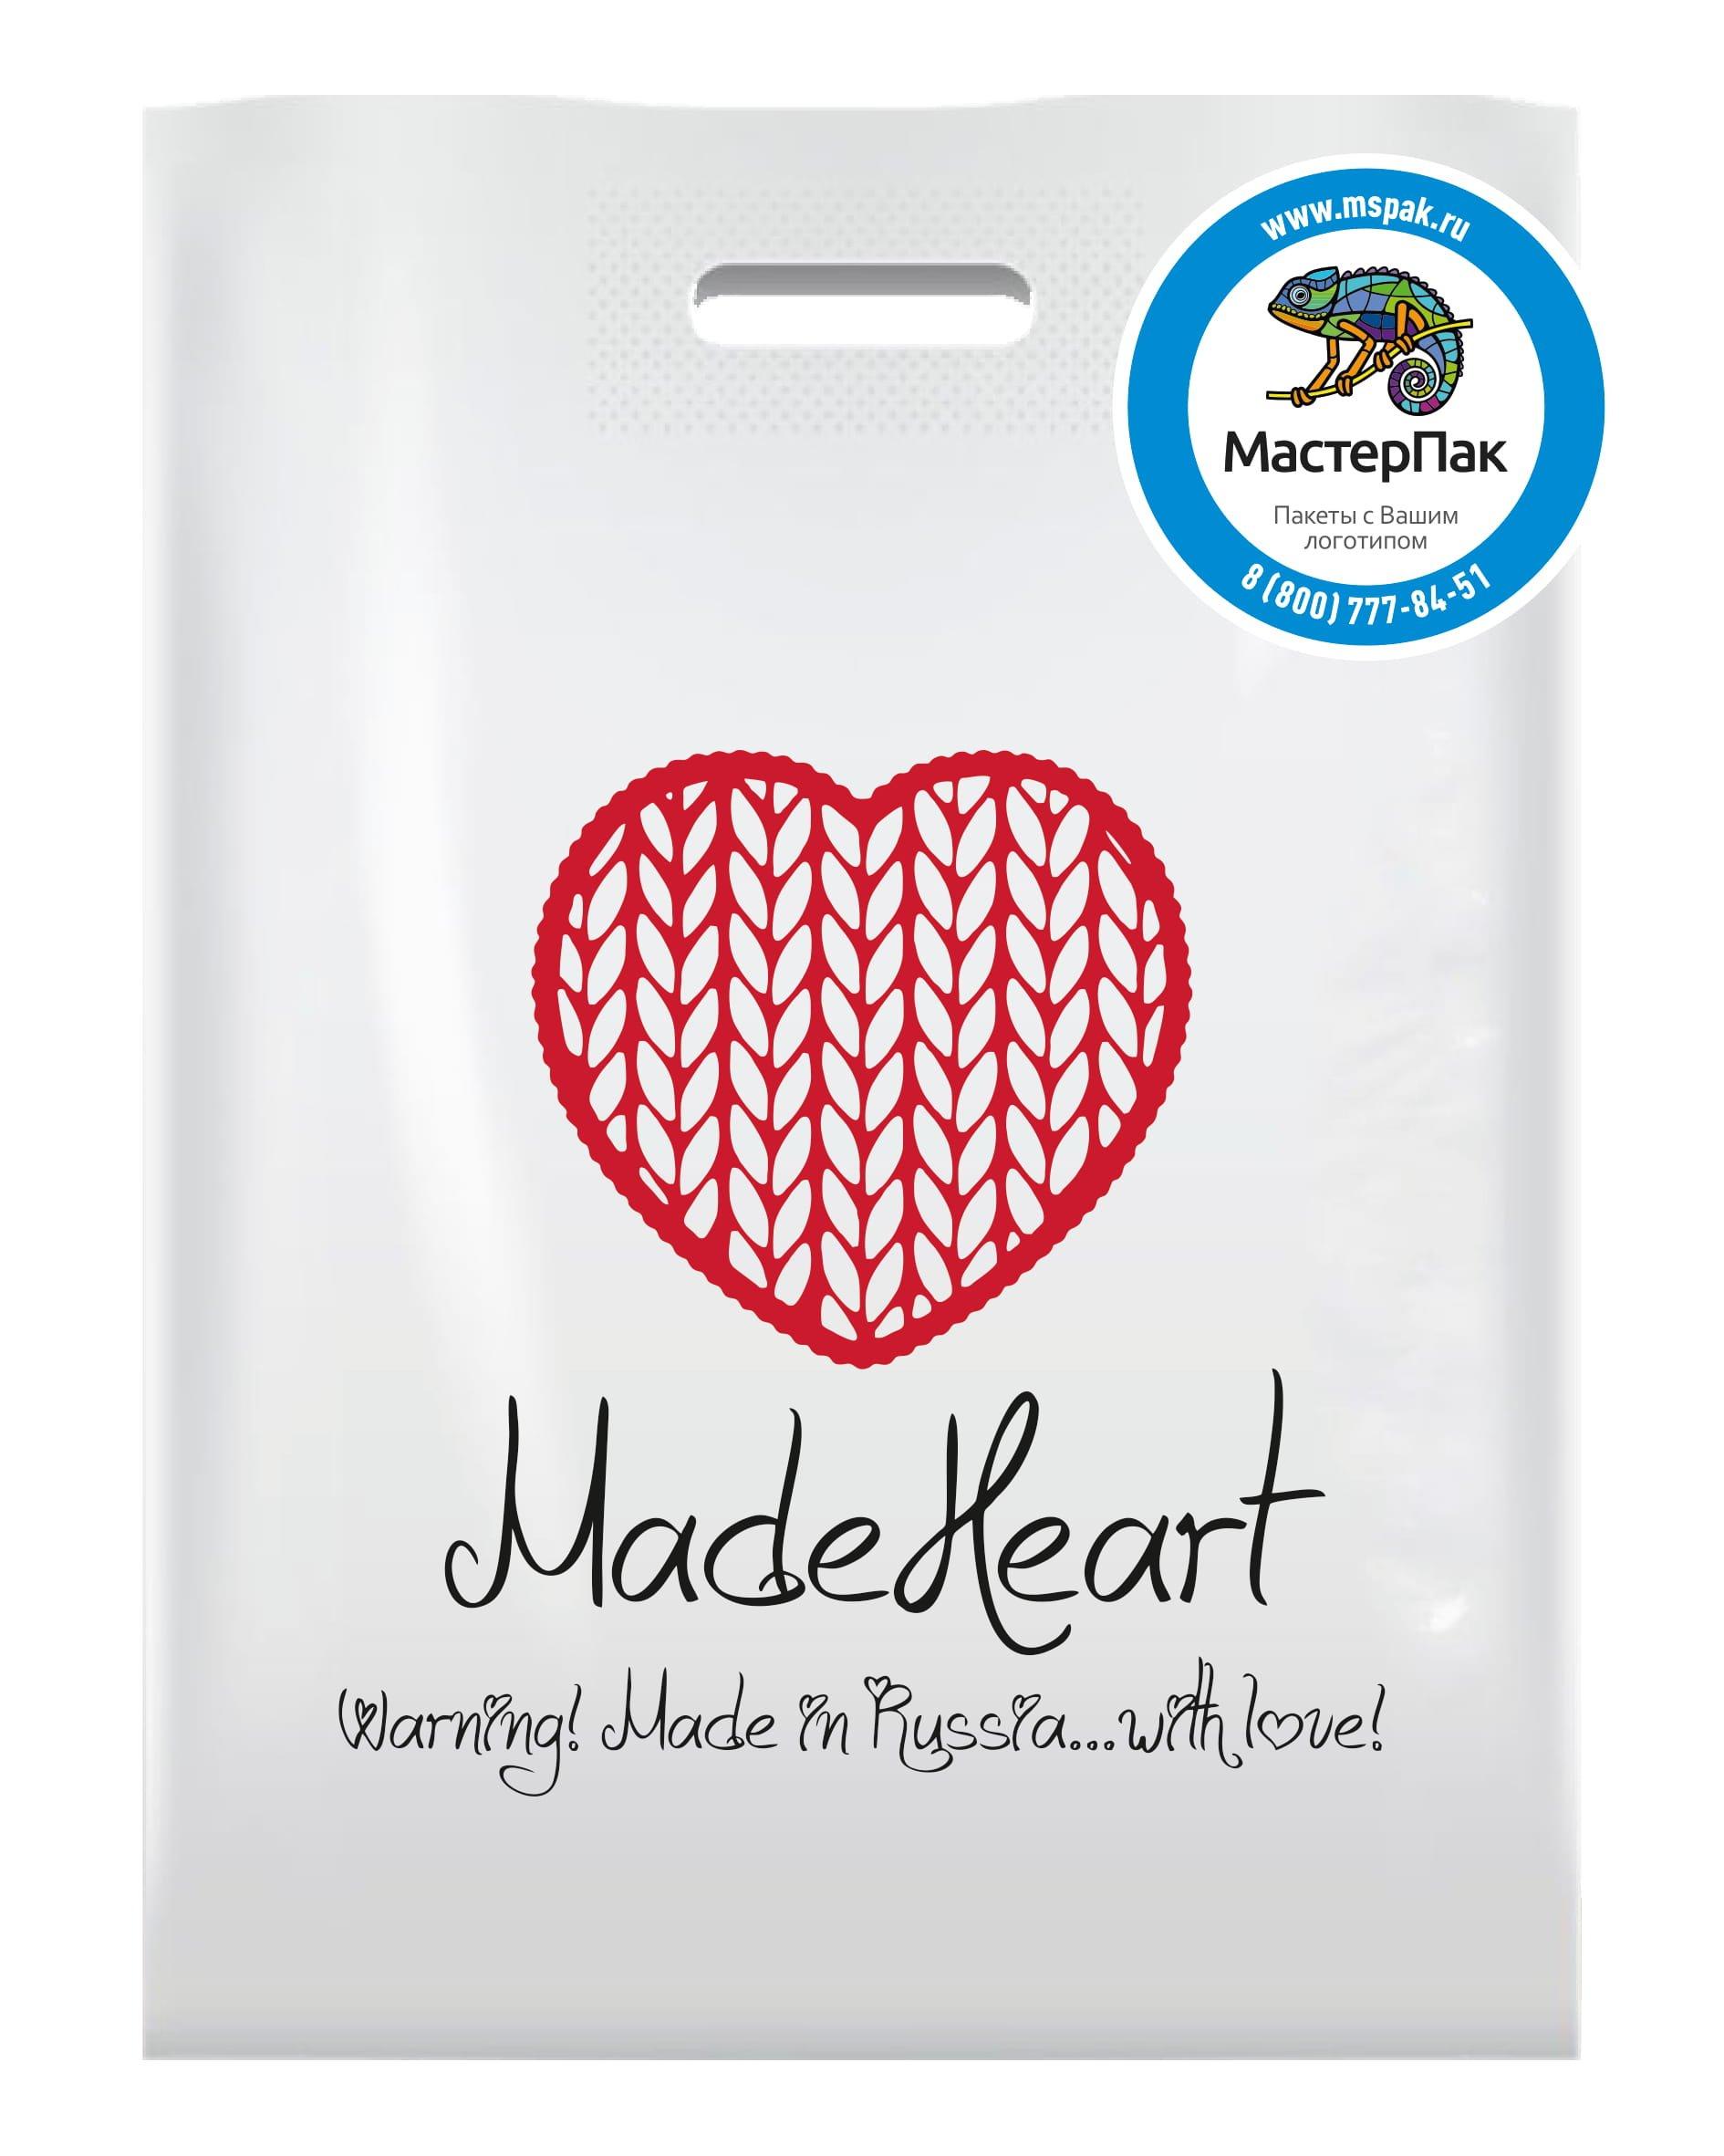 Пакет ПВД с логотипом Made Heart, Казань, 70 мкм, 30*40 см